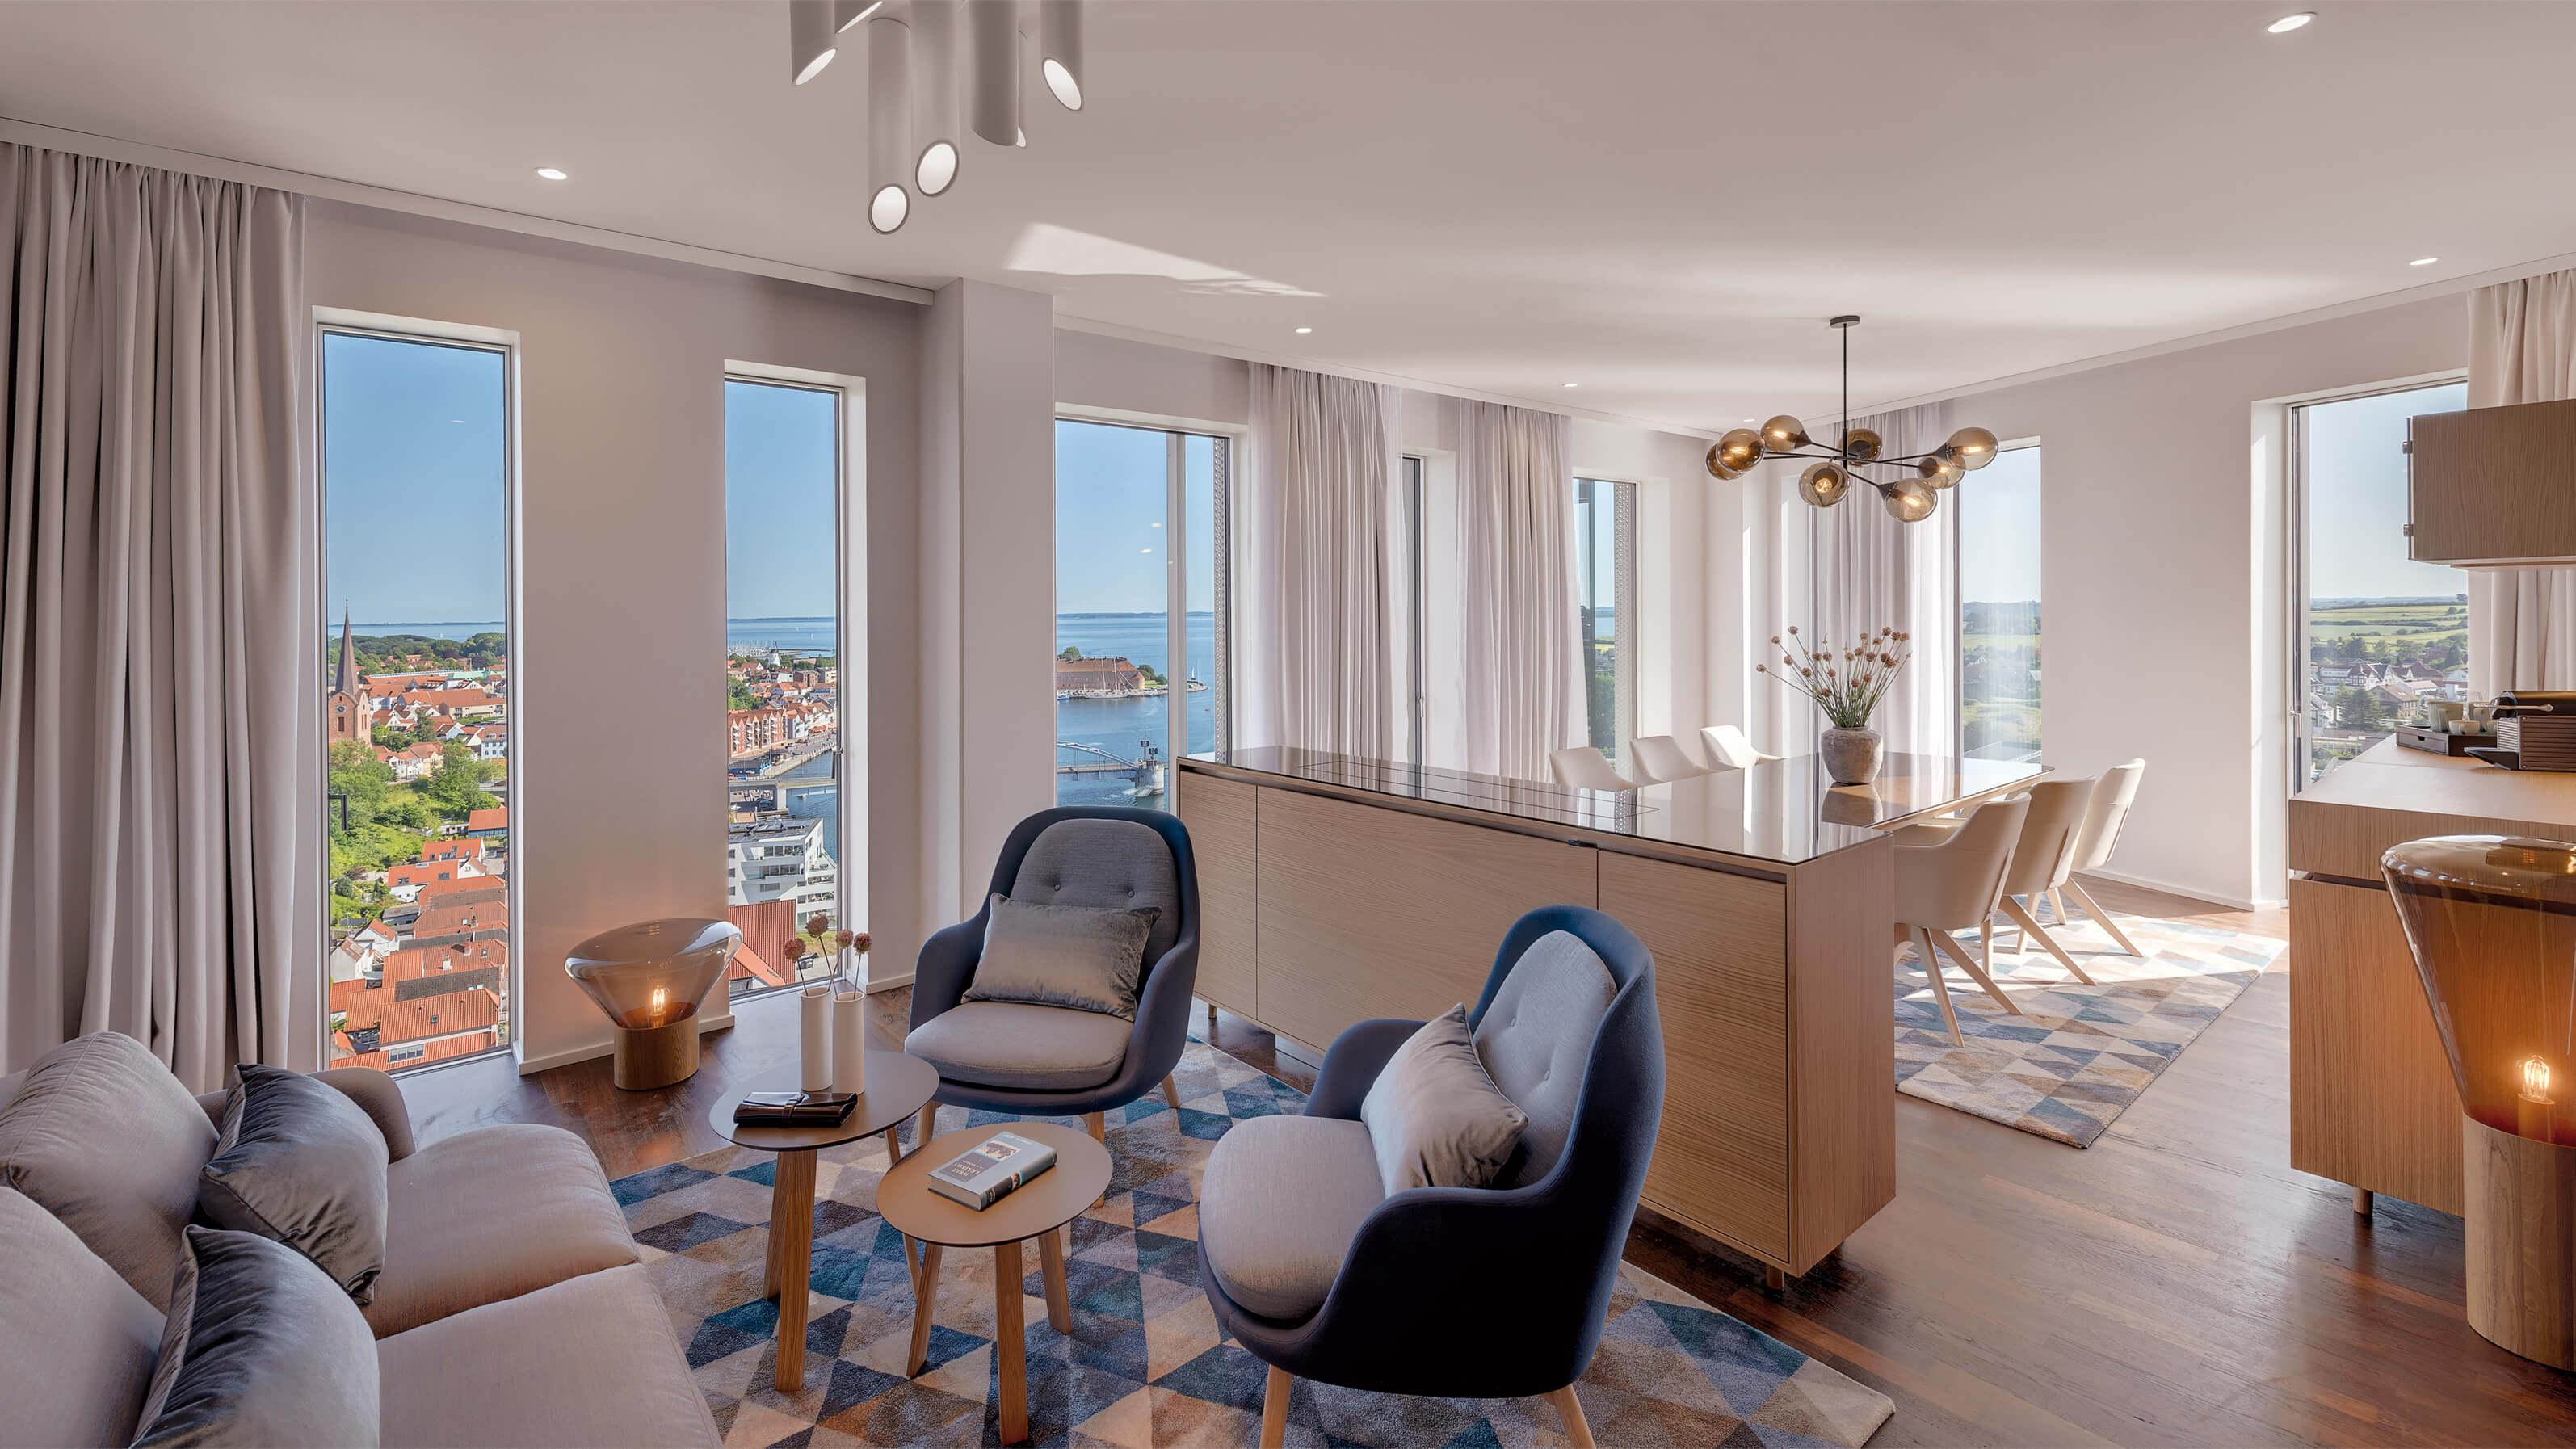 hotelausstattung-hoteleinrichtungen-bachhuber-Alsik-Sonderborg6